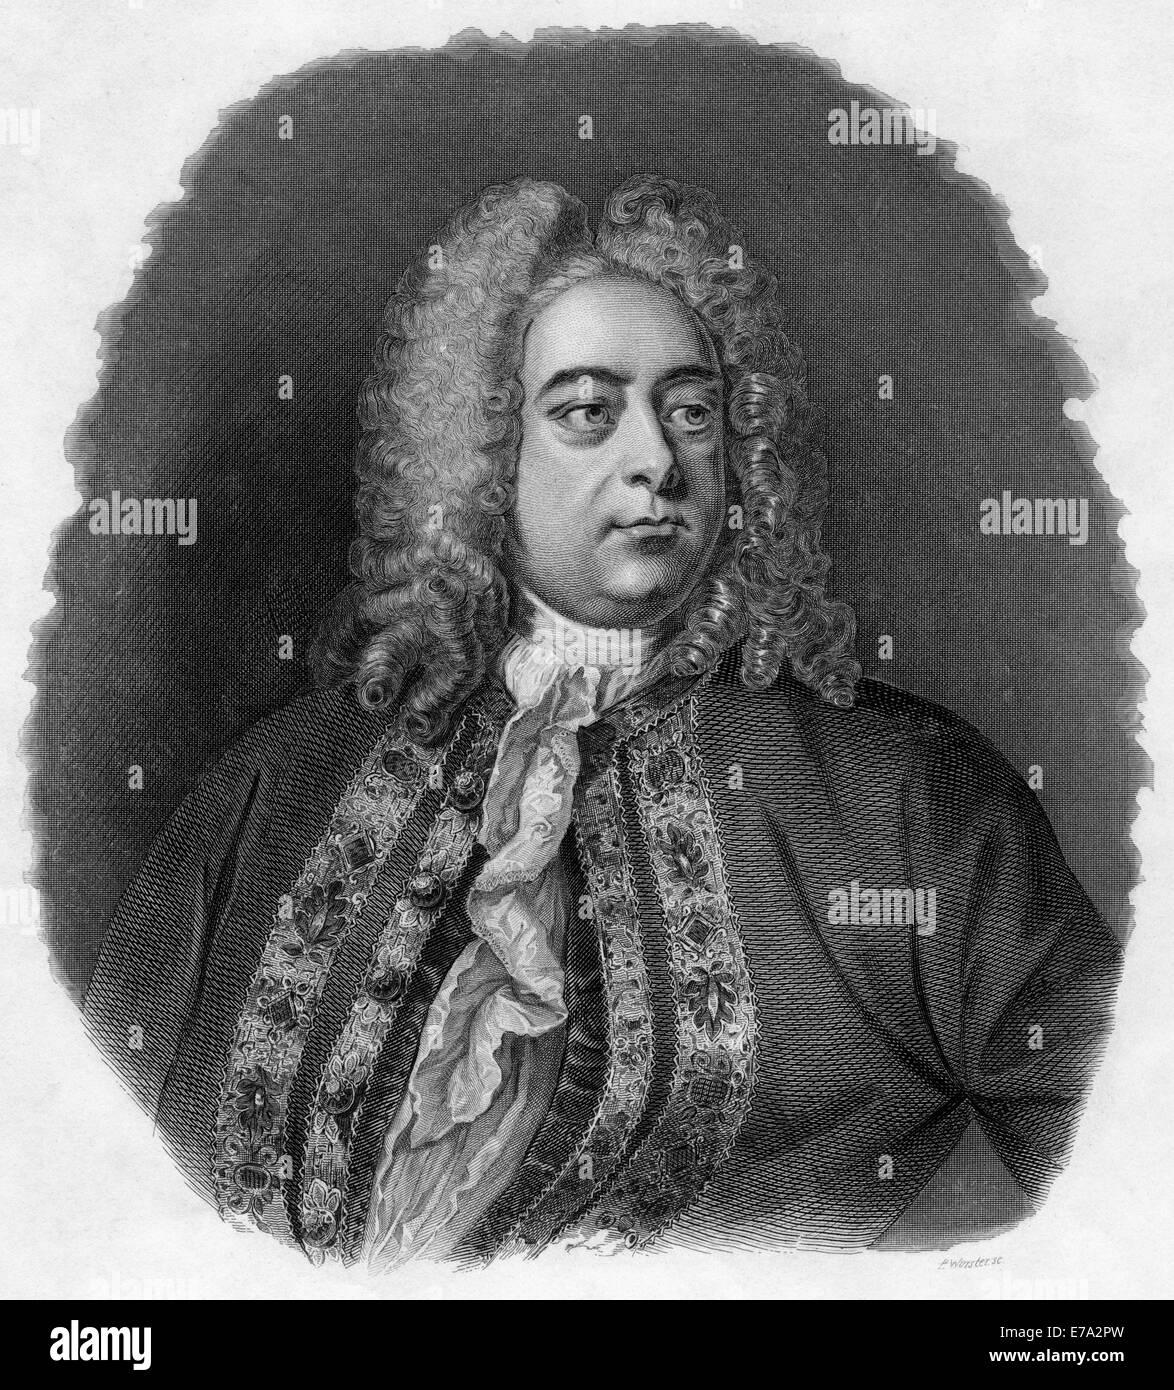 Georg Friedrich Händel (1685-1759), Barockkomponist, Porträt, Gravur, 1856 Stockbild